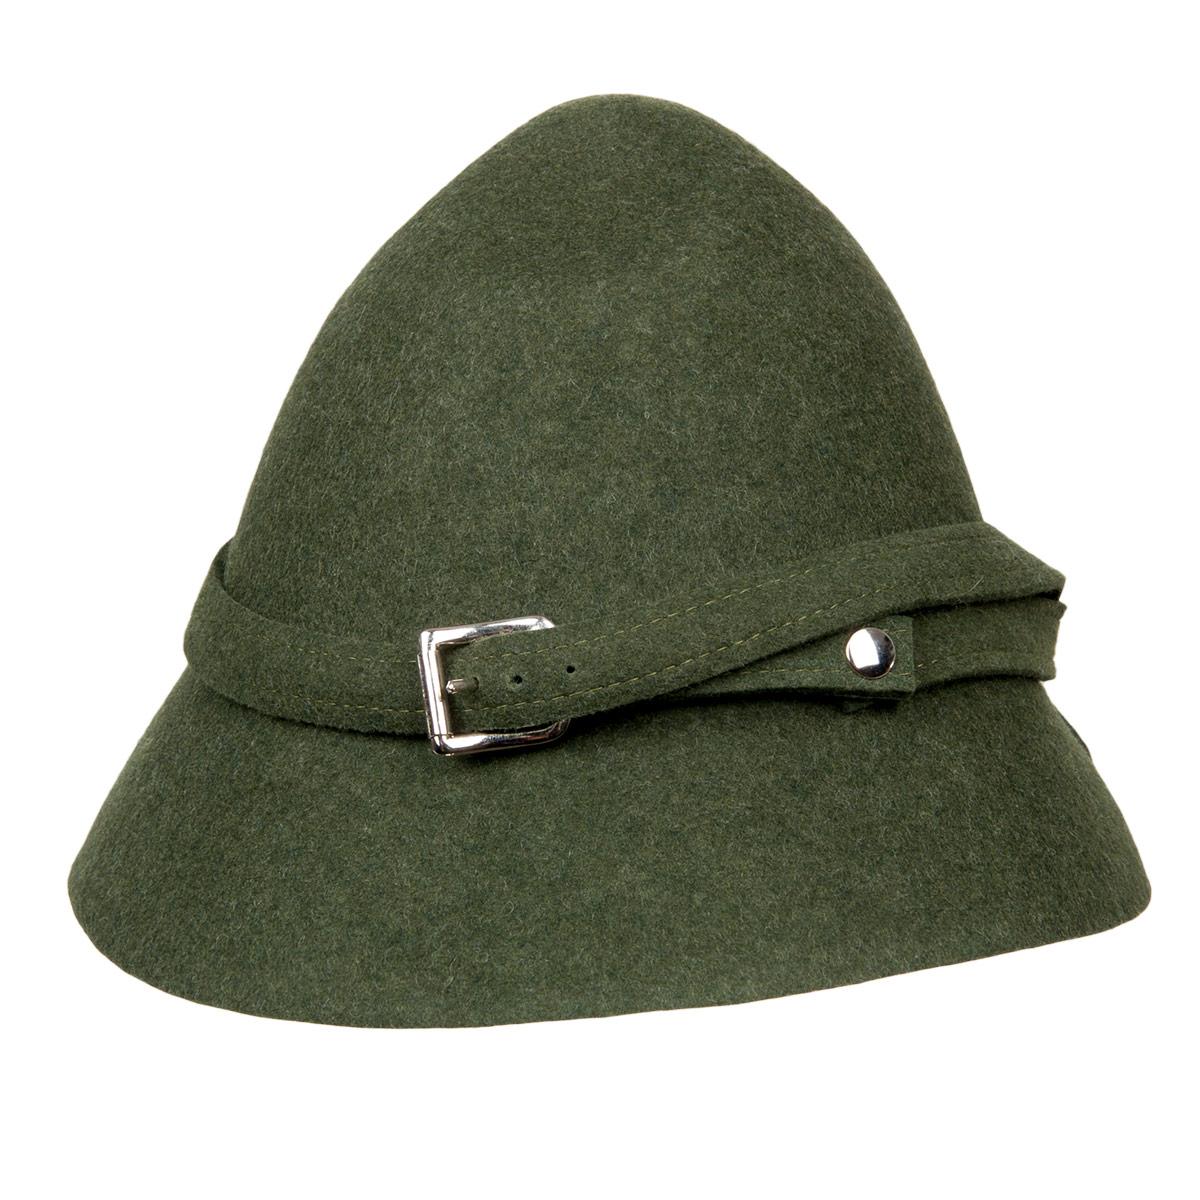 bbea5f88d Pocket Tyrolean hat in felt signed by HUTTER